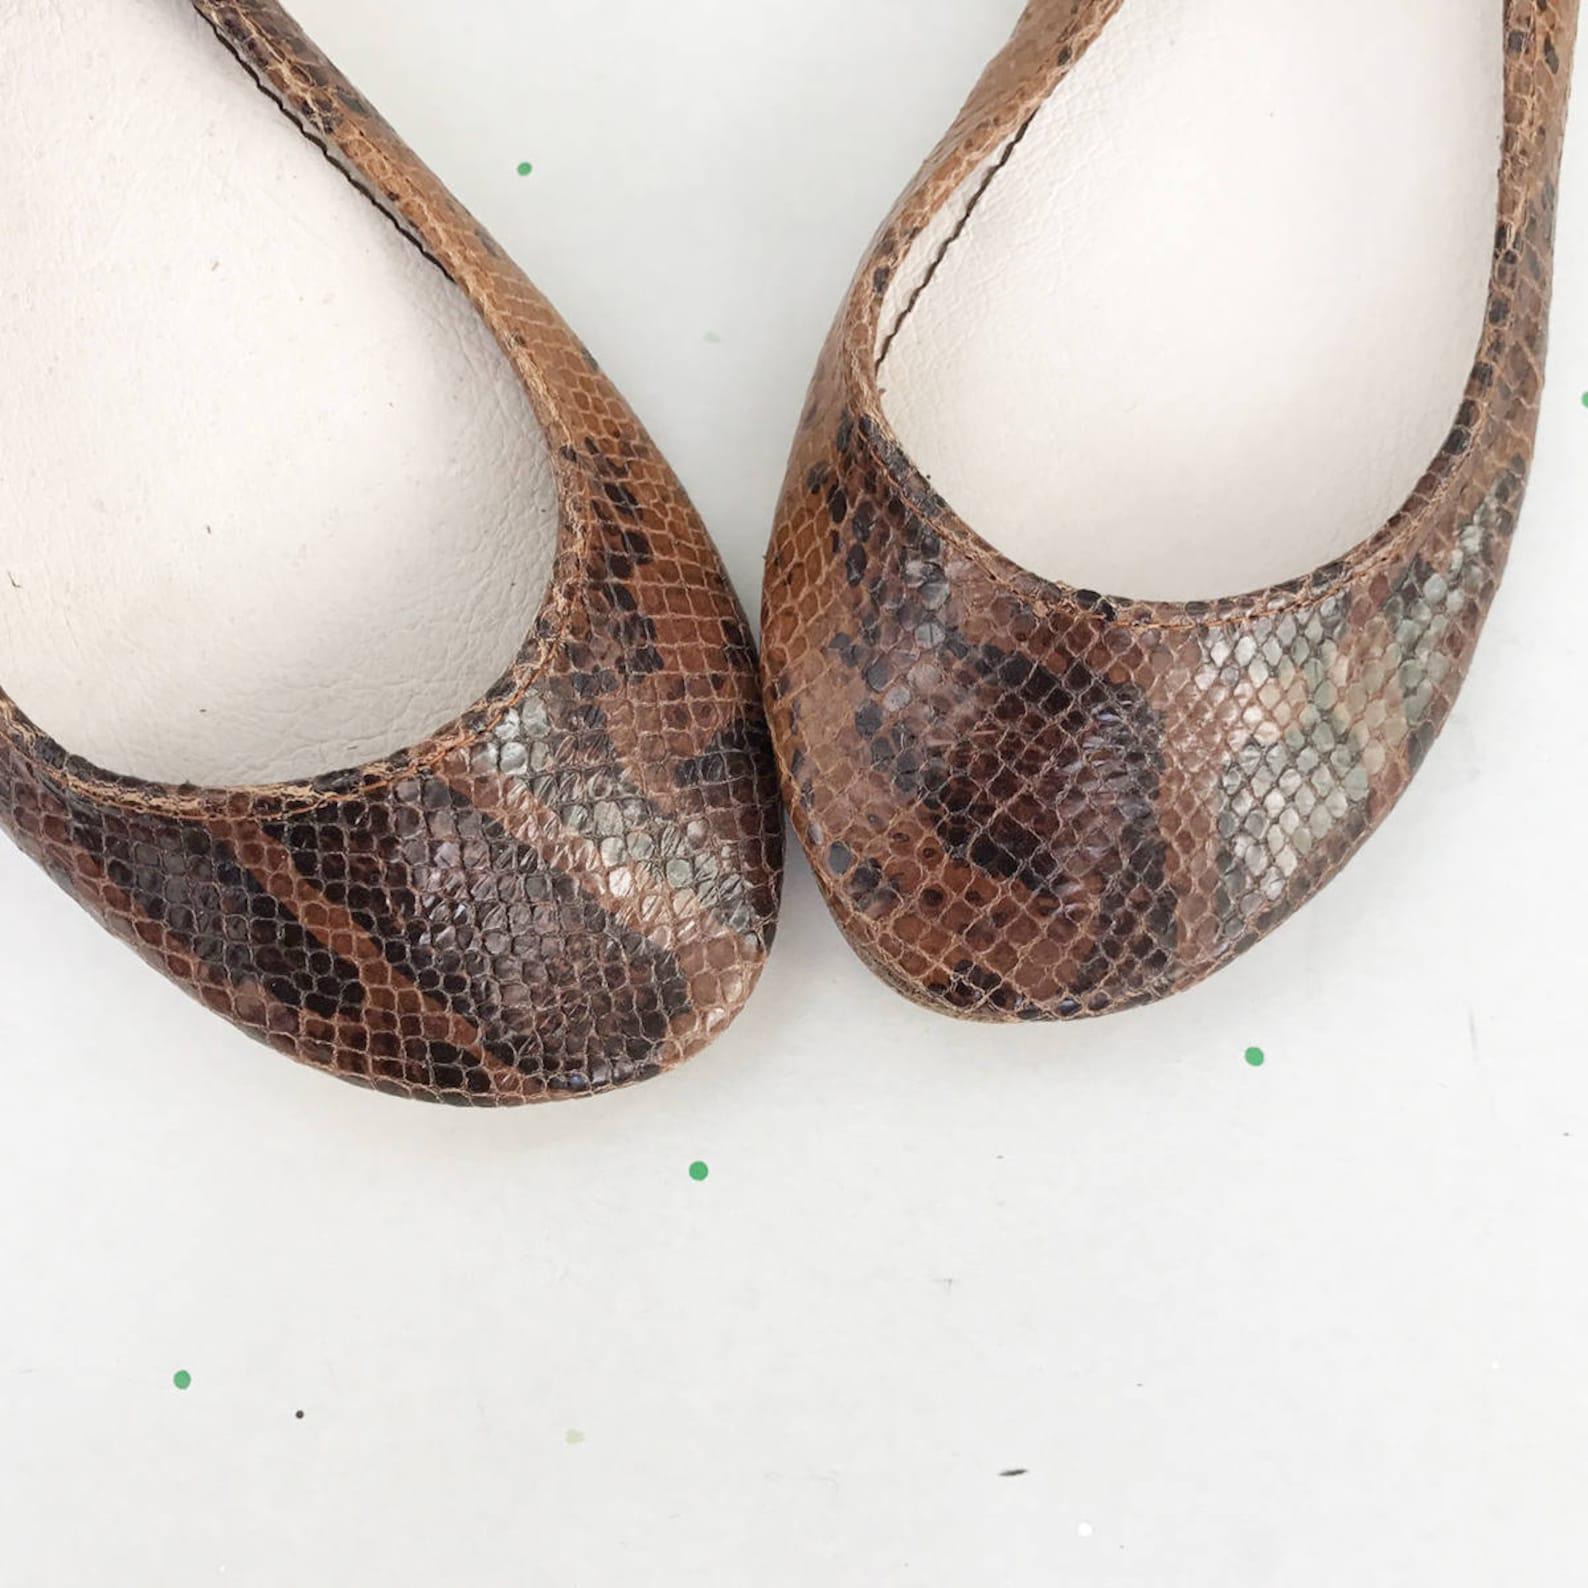 women leather shoes. women flats. ballet flats. handmade ballet flats. brown leather shoes. shoes women. italian leather shoes.